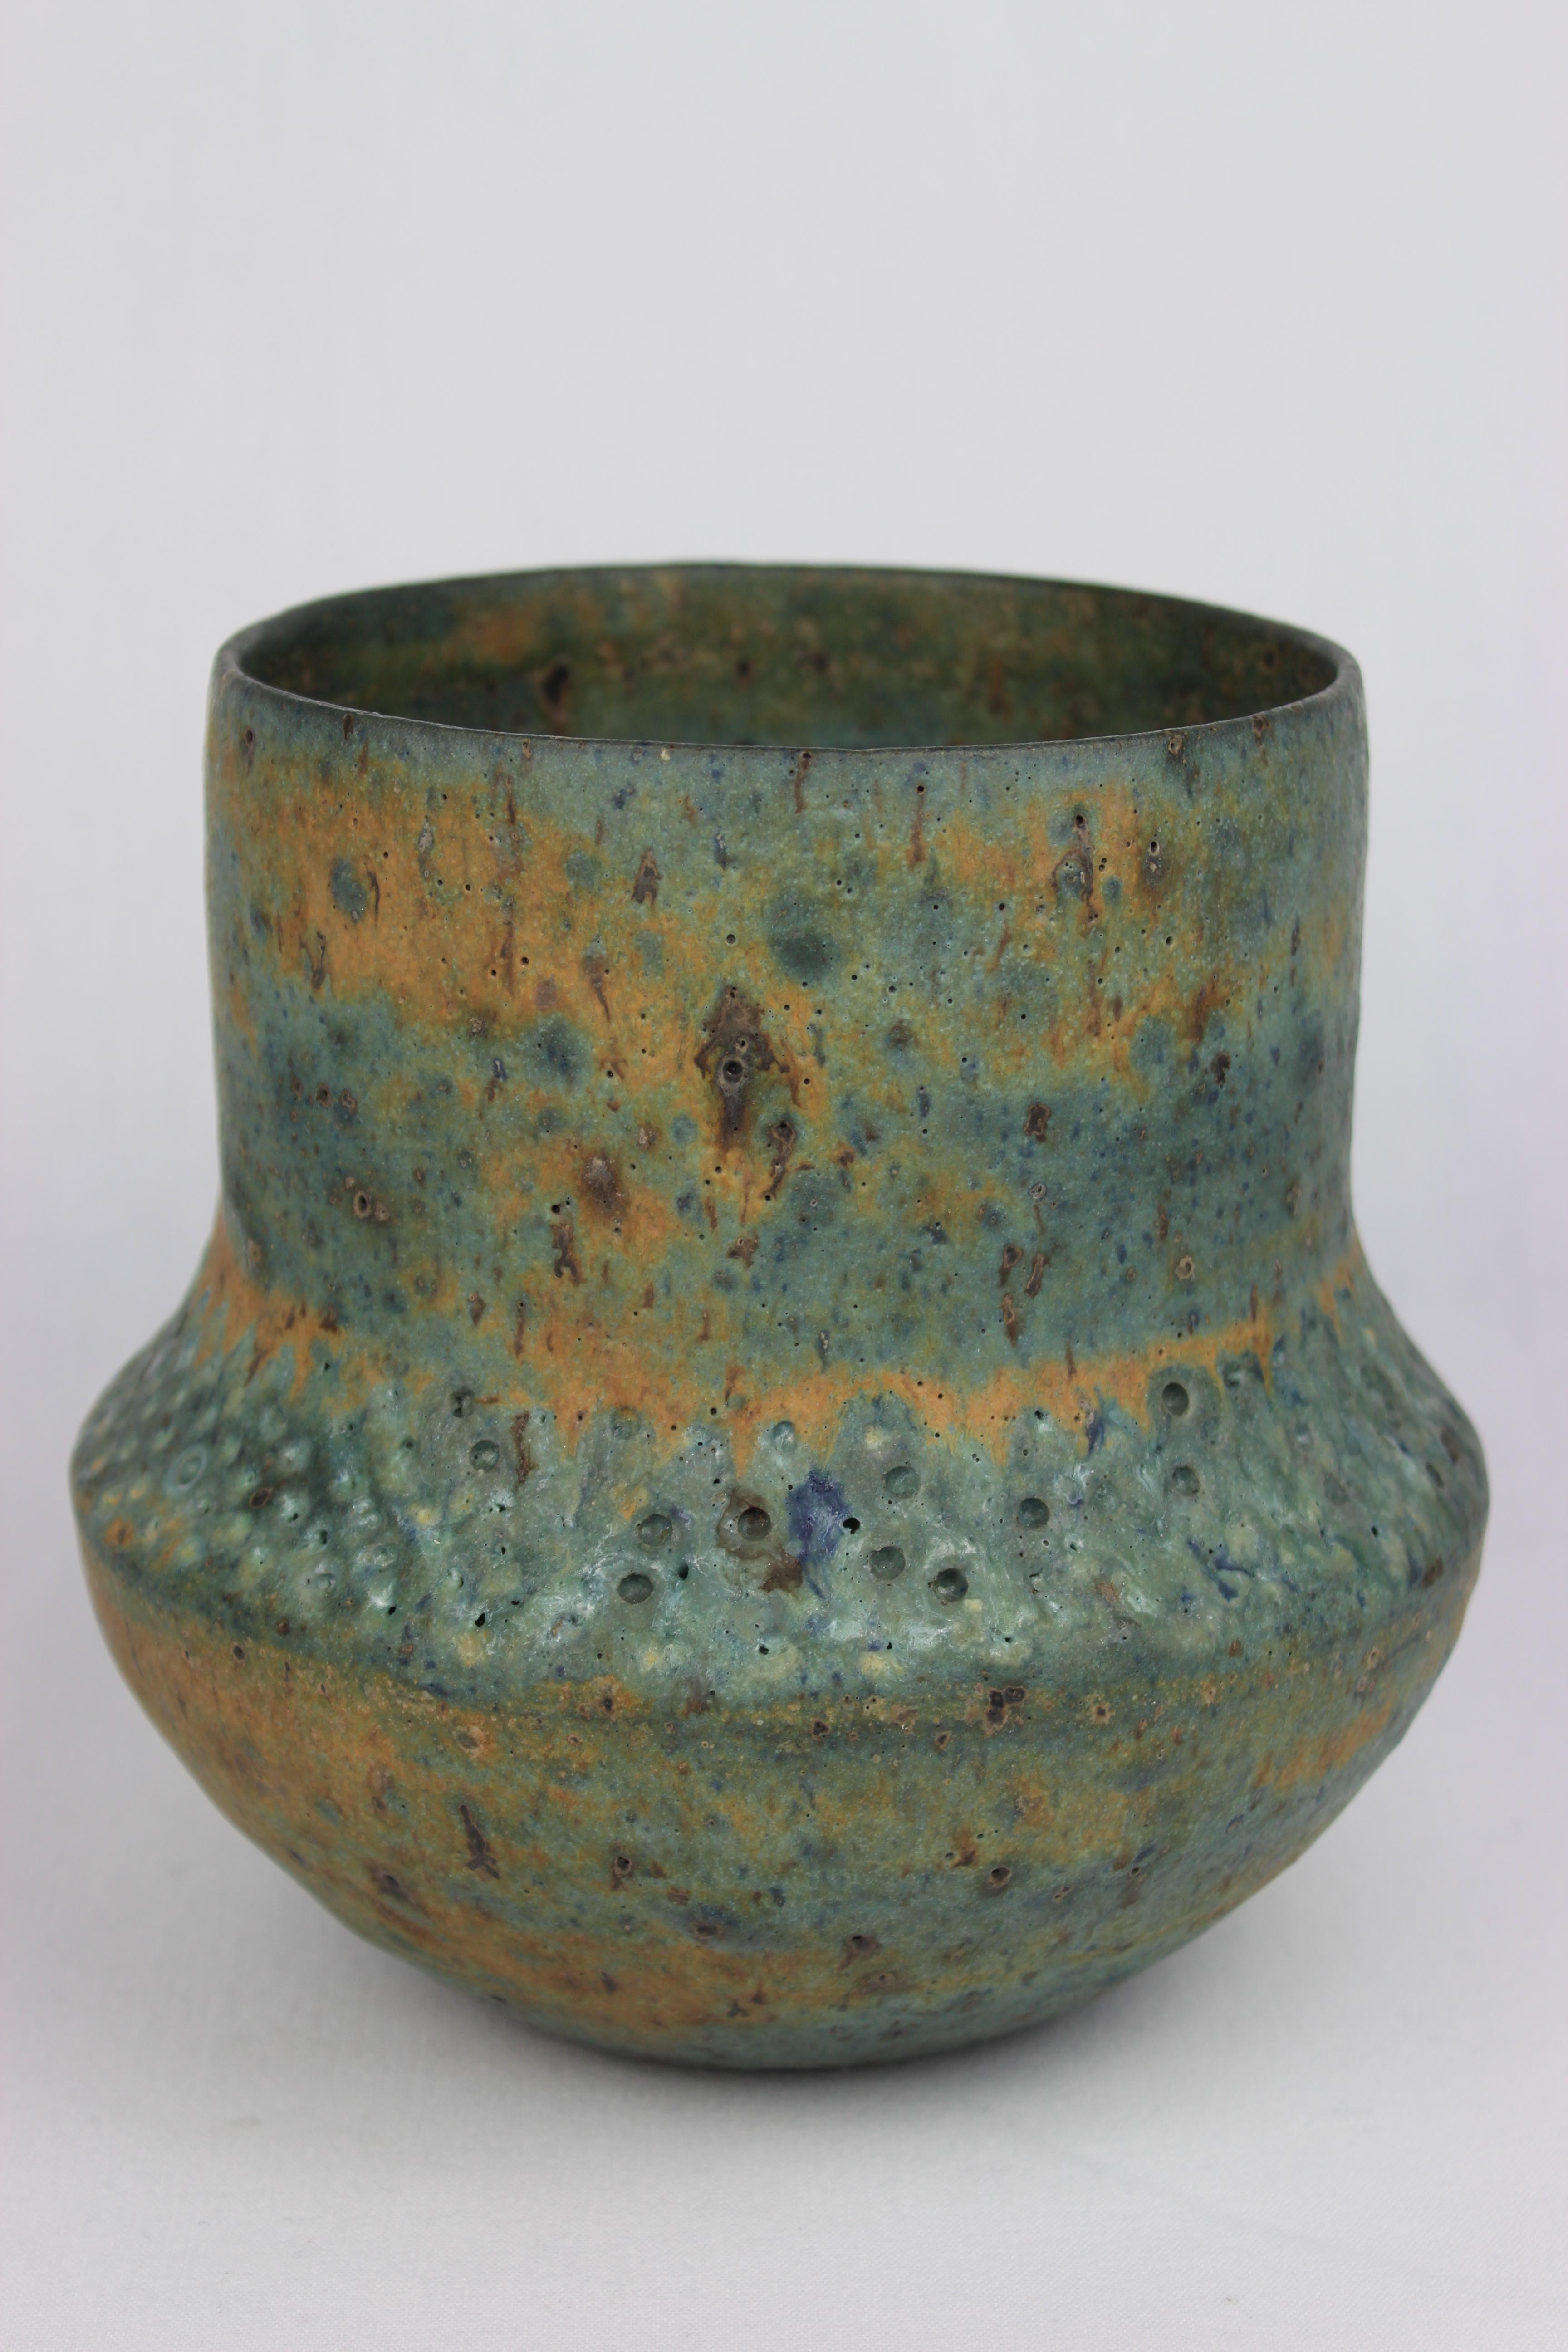 Filethrown vase by lucie rie yorym 20041100g wikimedia filethrown vase by lucie rie yorym 20041100g reviewsmspy